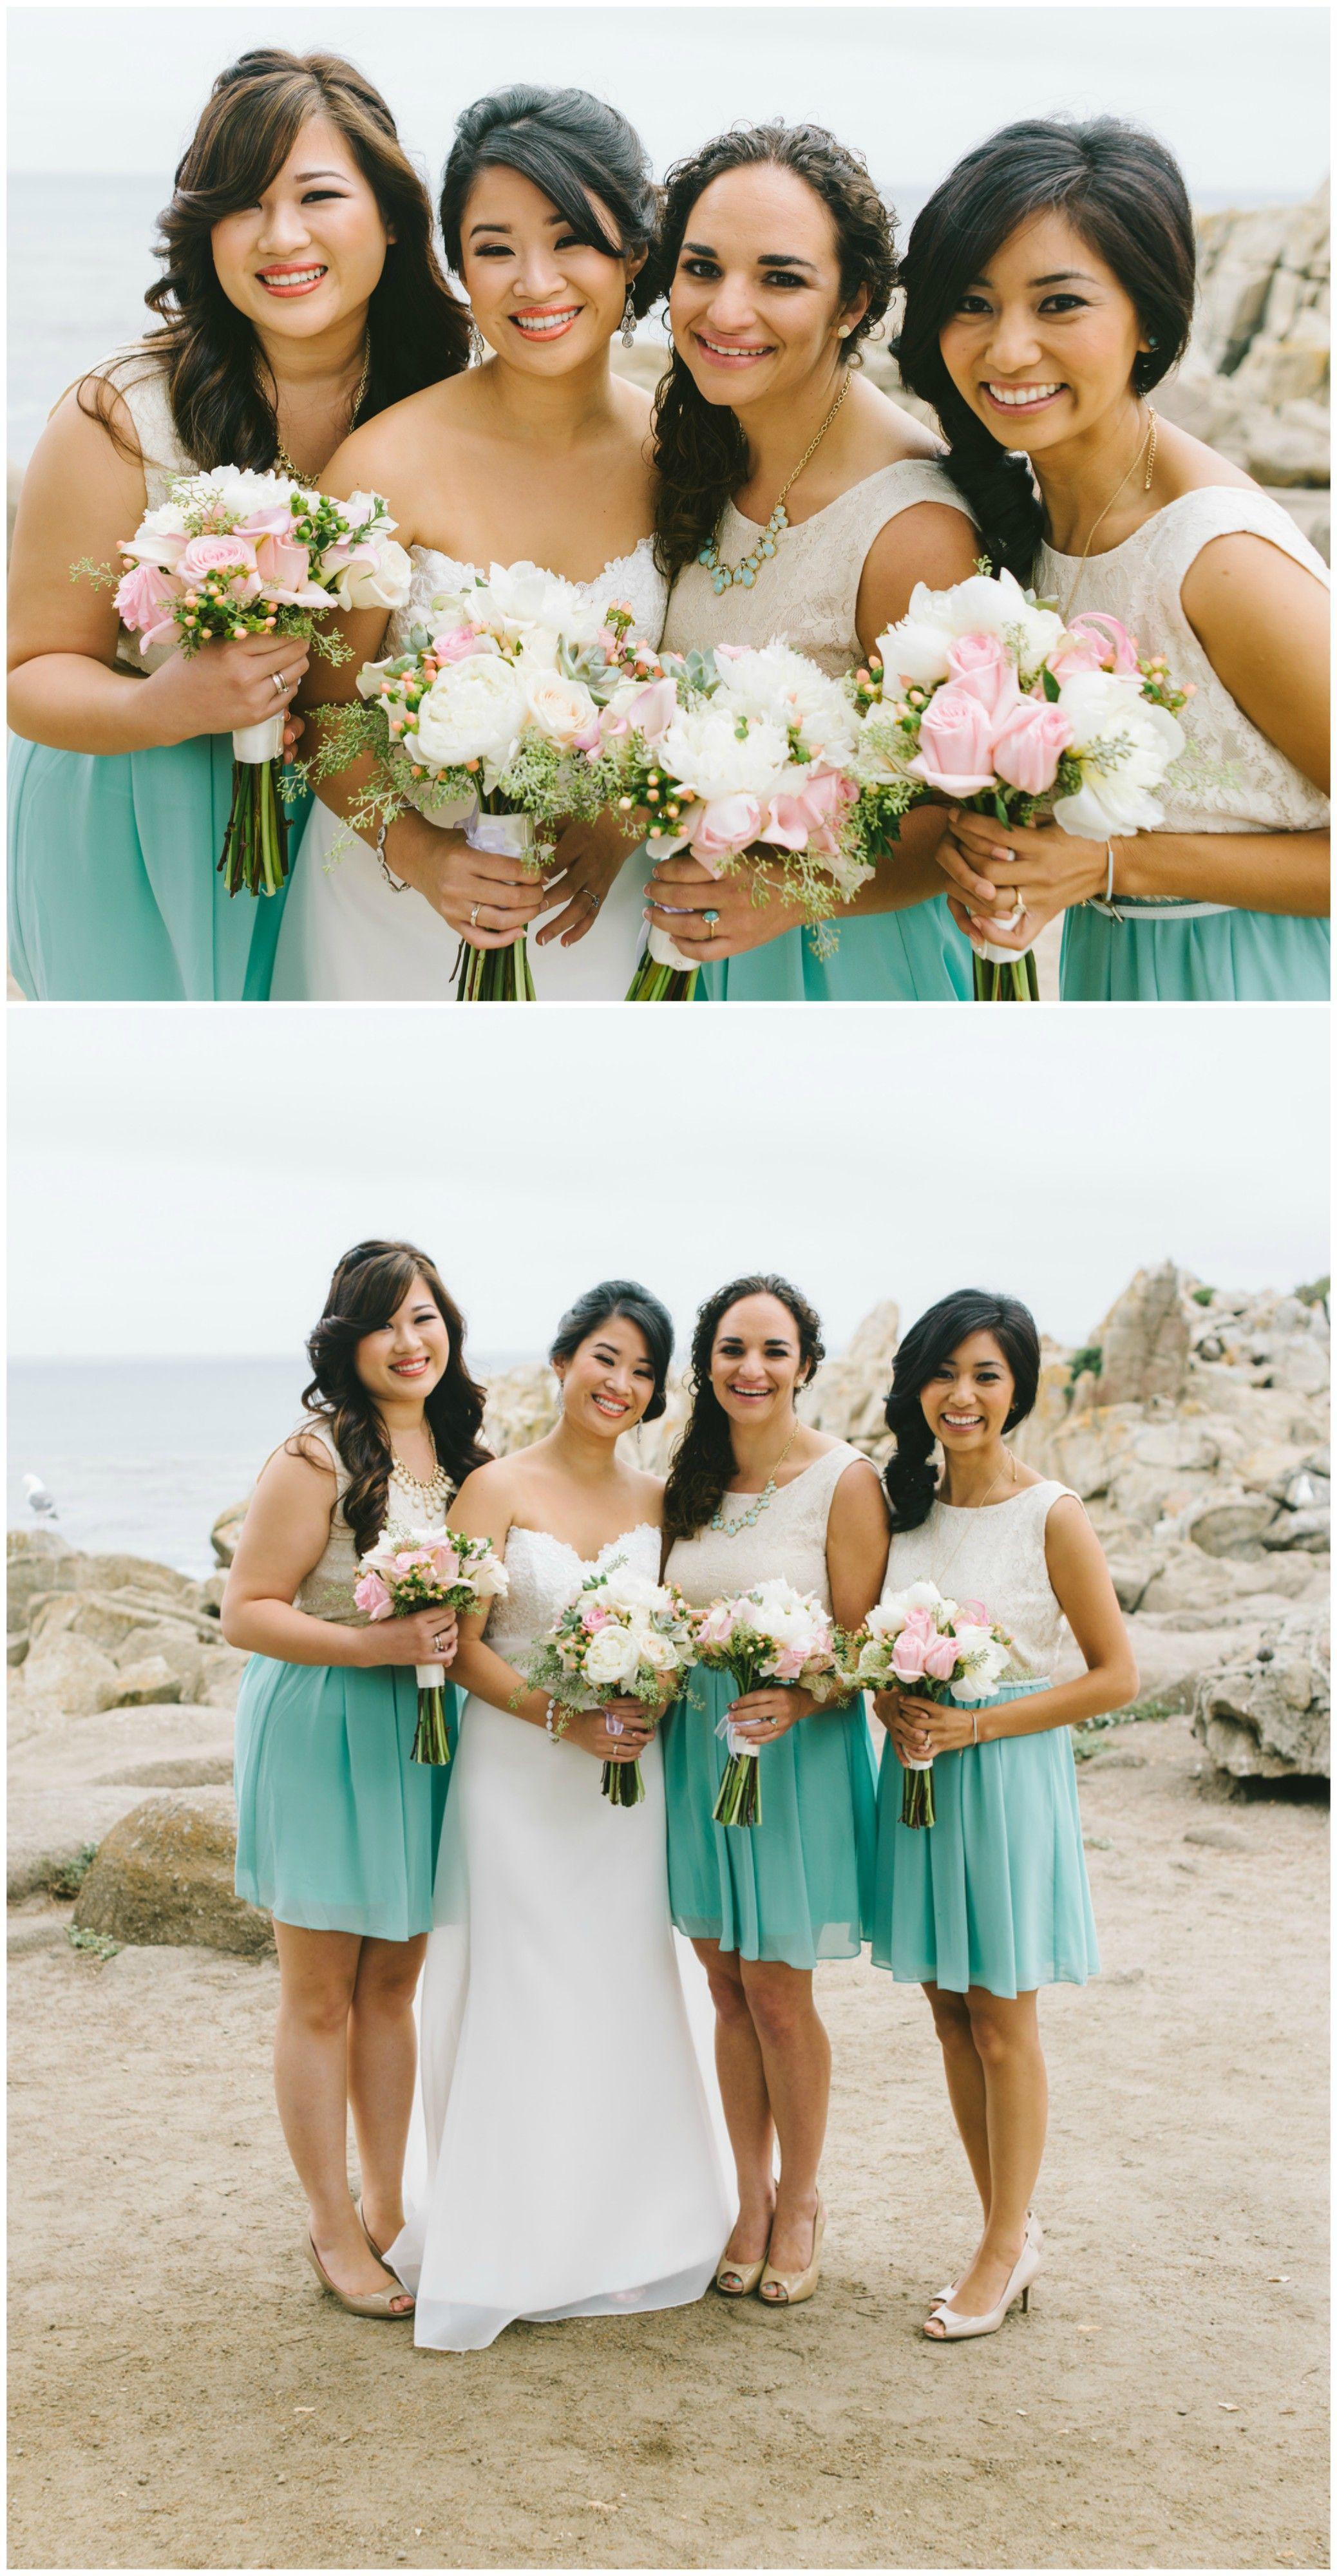 California bridal party, beach wedding, short white and